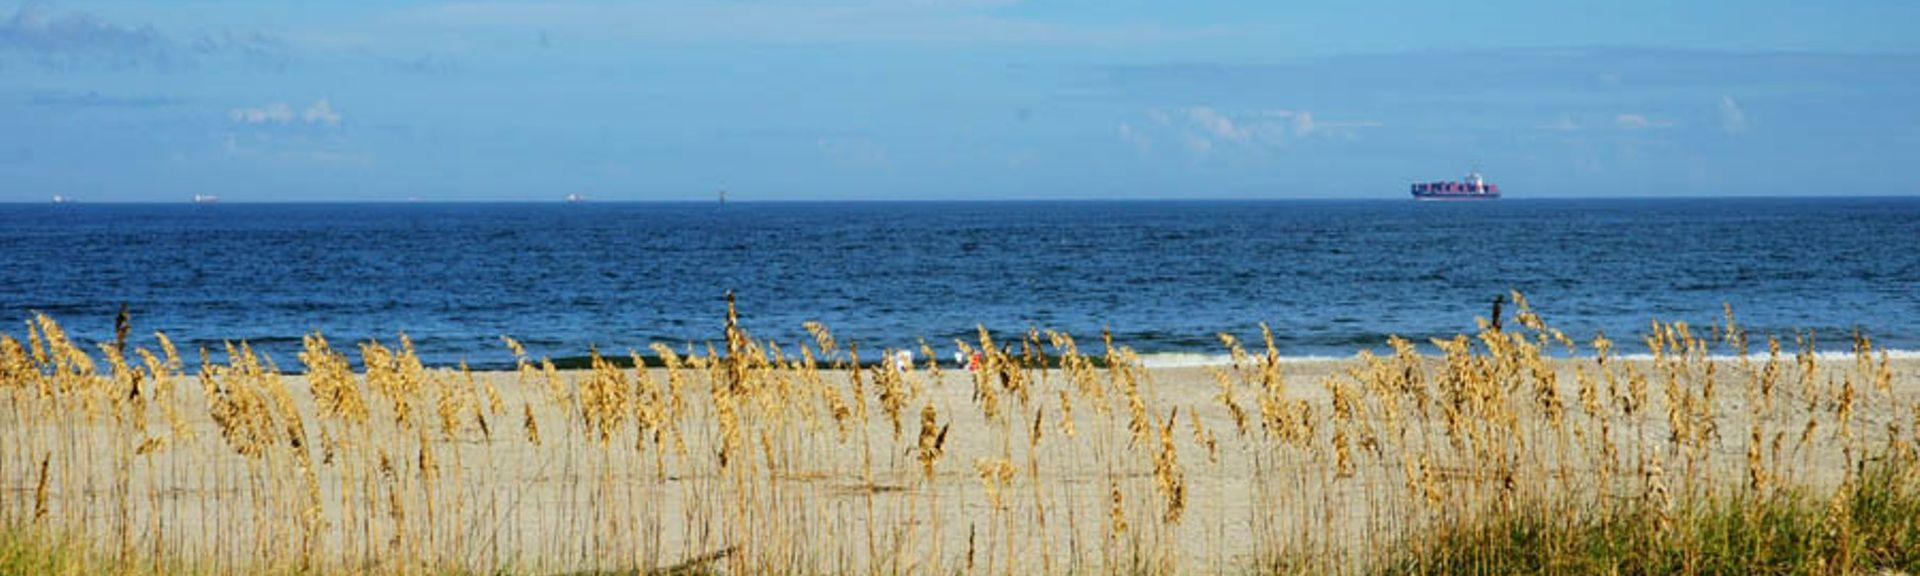 Beachside Colony, Tybee Island, GA, USA